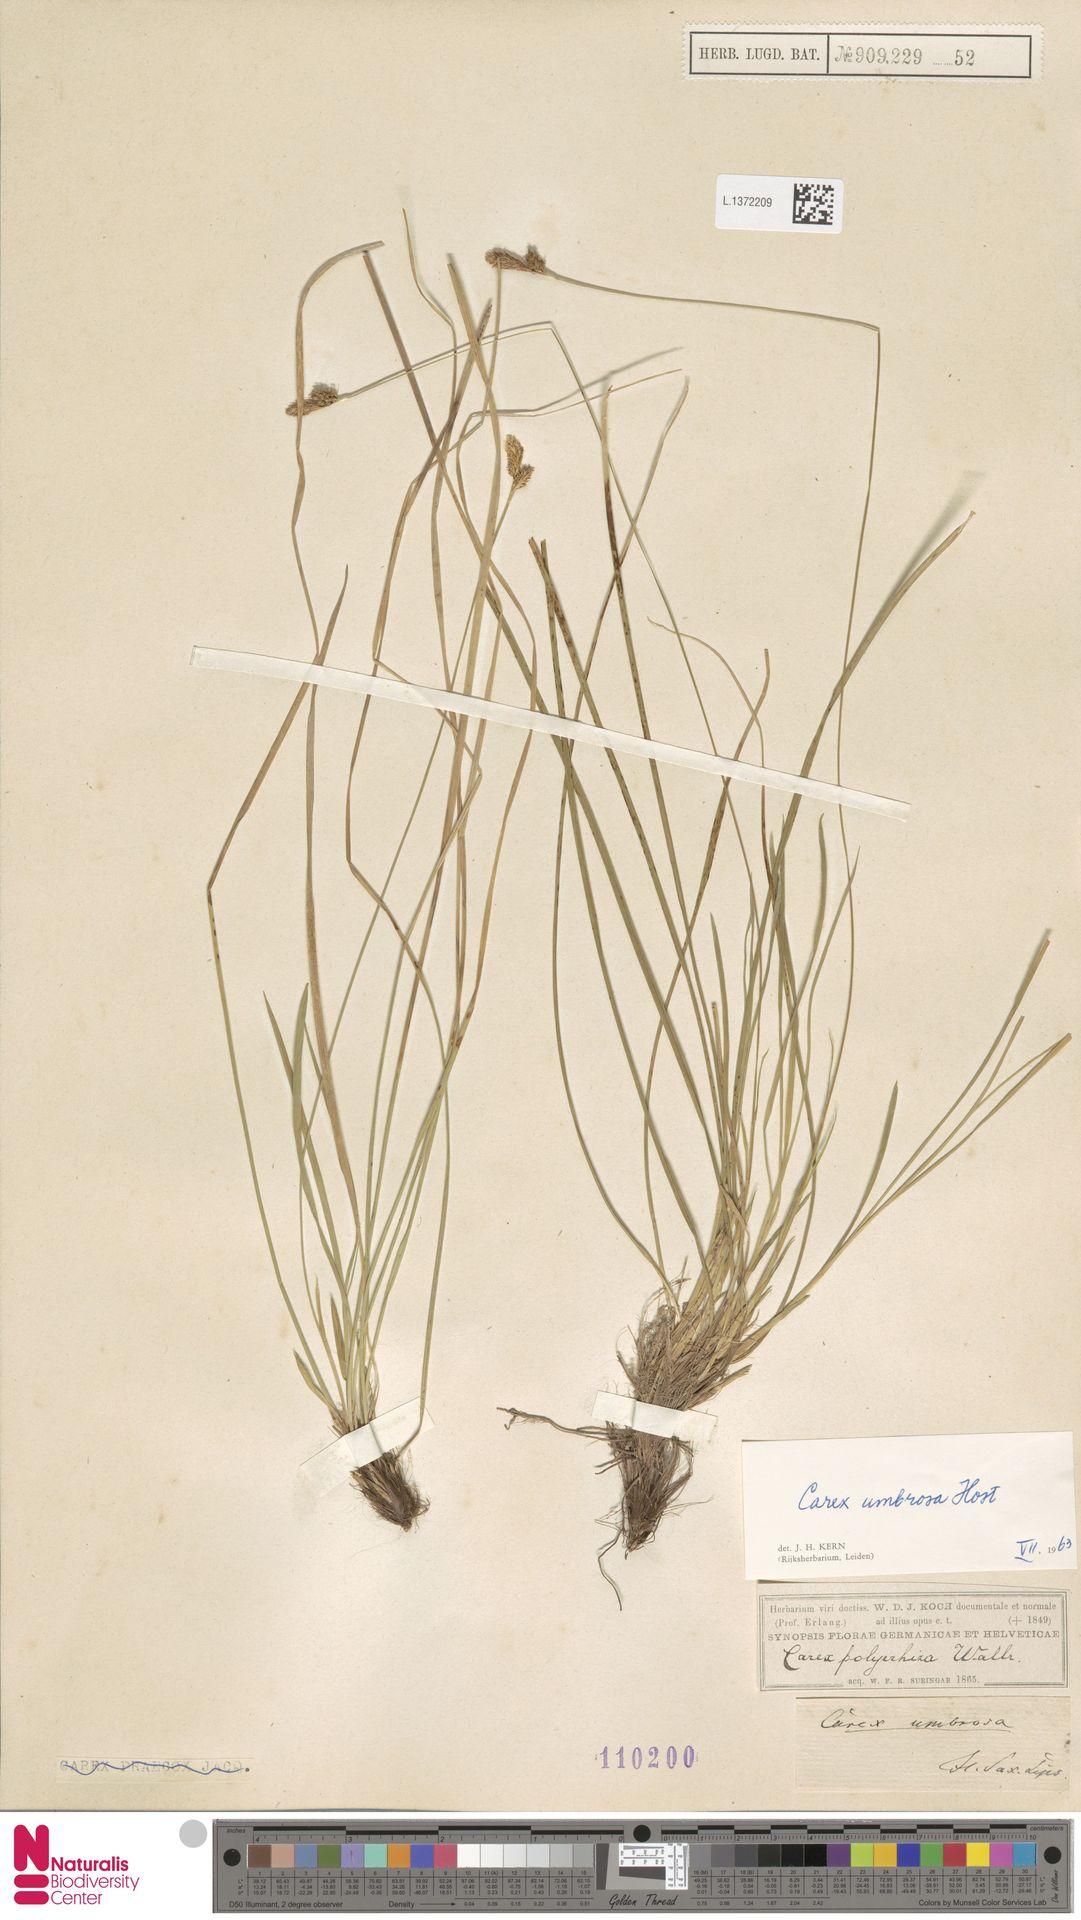 L.1372209 | Carex umbrosa Host